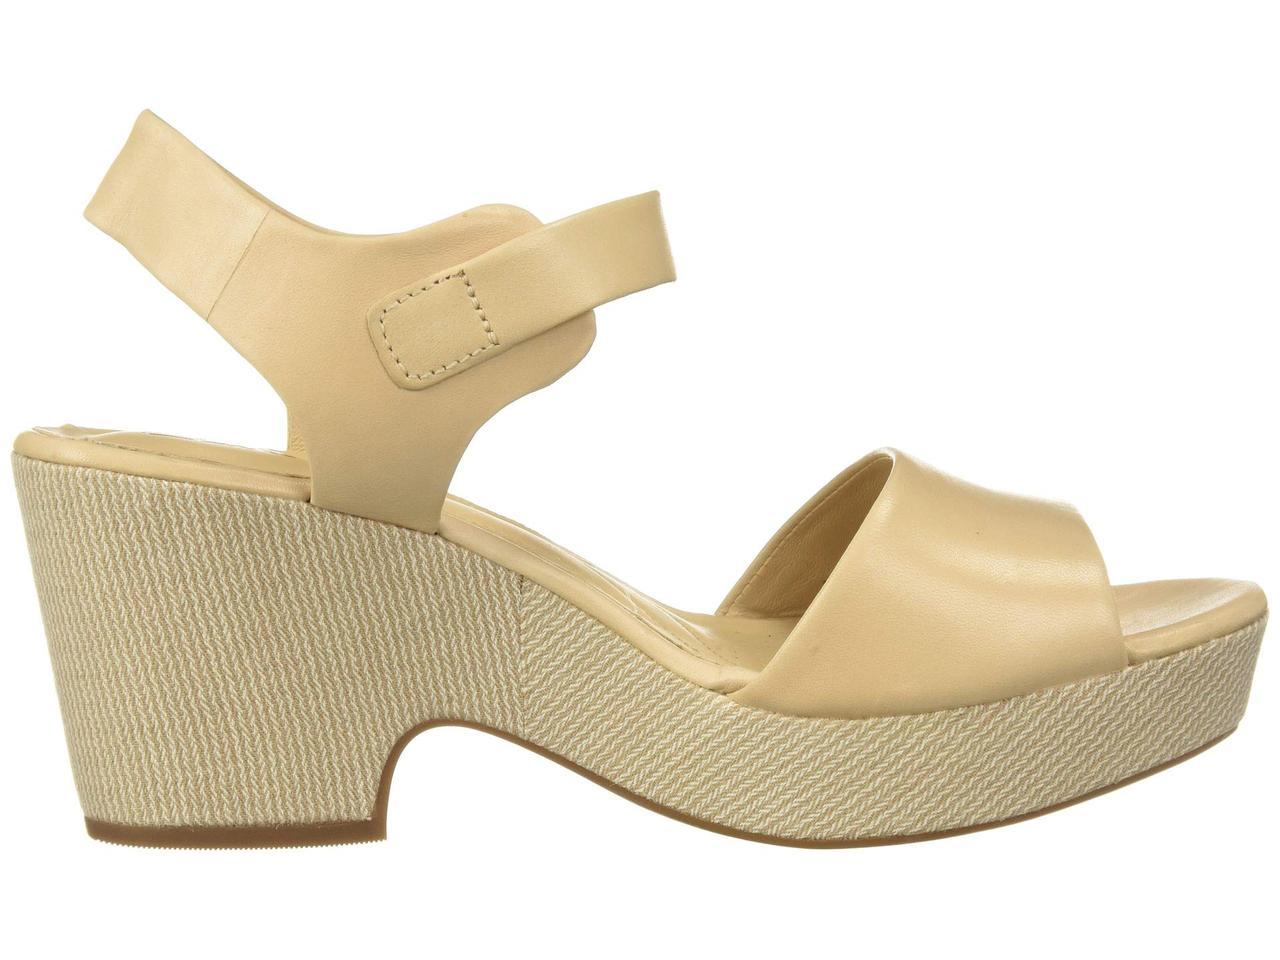 48059e03a7ba Туфли на каблуке (Оригинал) Clarks Maritsa Janna Nude Leather